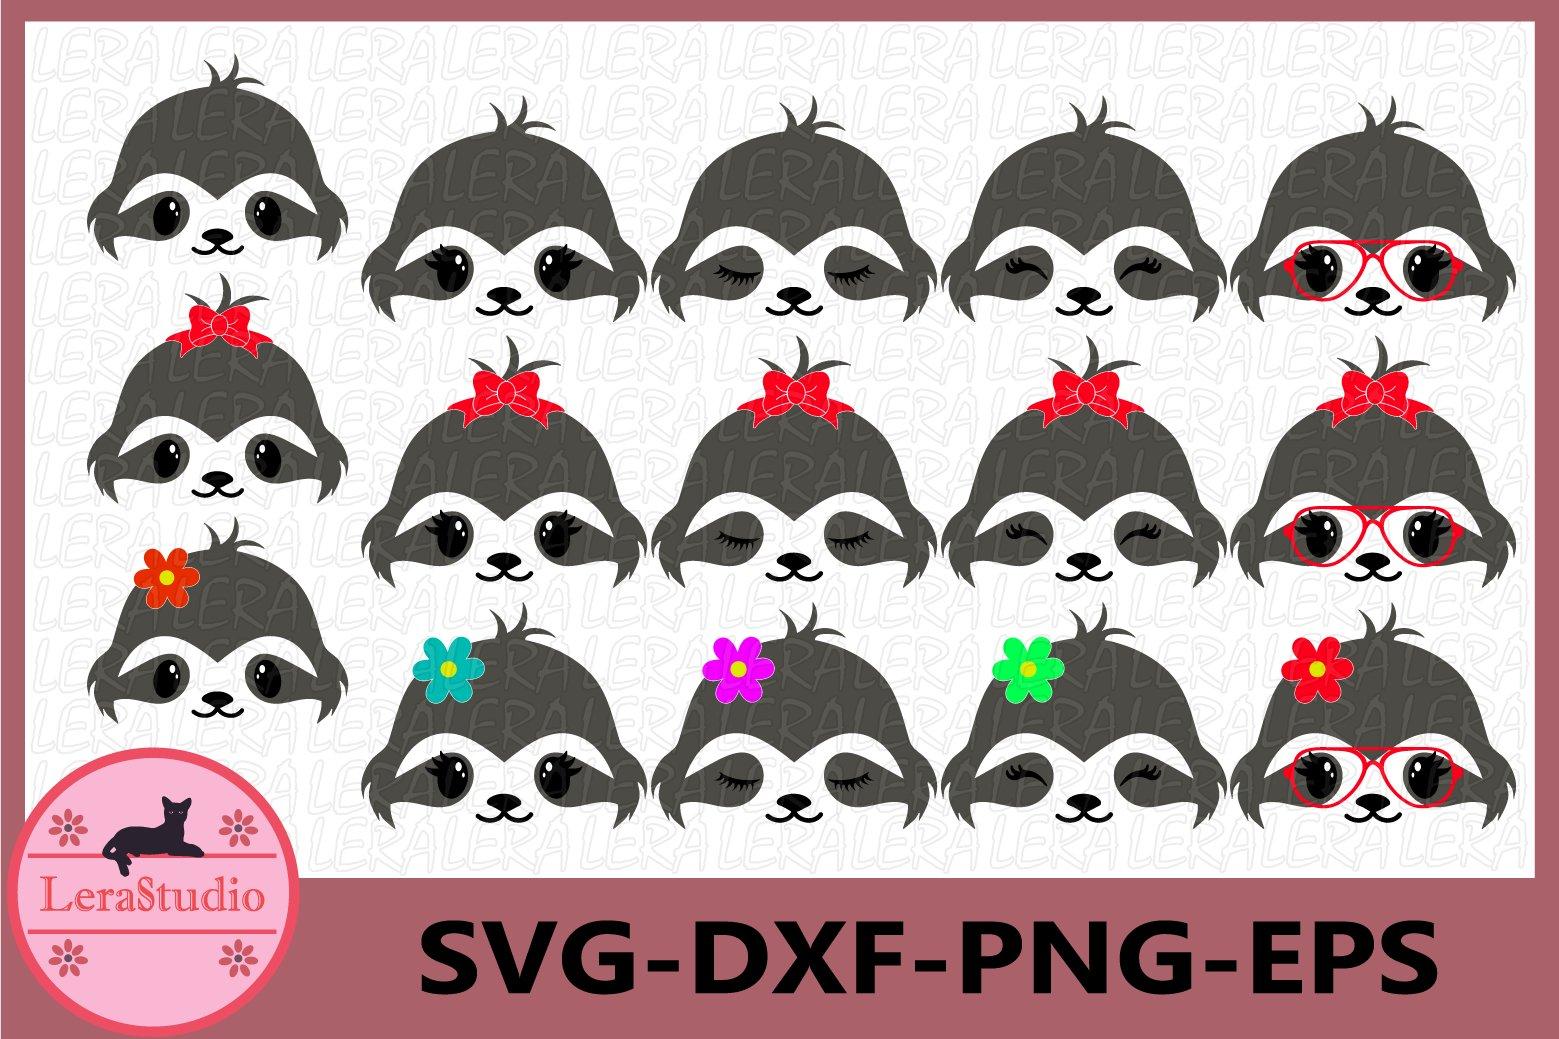 Sloth Face Svg Animal Face Svg Cute Sloth Eyelashes Face 513425 Cut Files Design Bundles